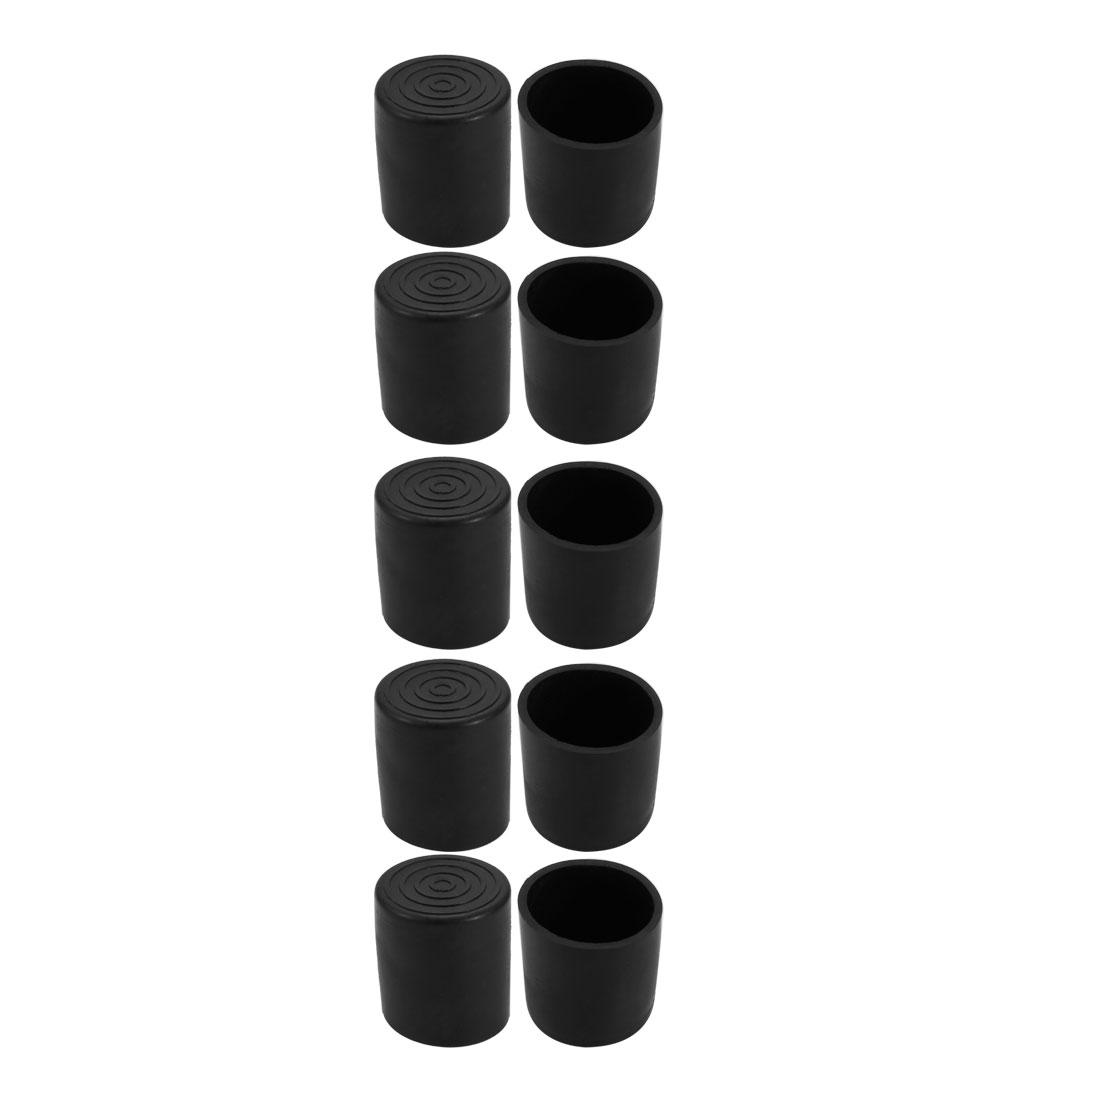 10pcs 22mm Dia Black PVC Rubber Round Cabinet Leg Insert Cover Protector